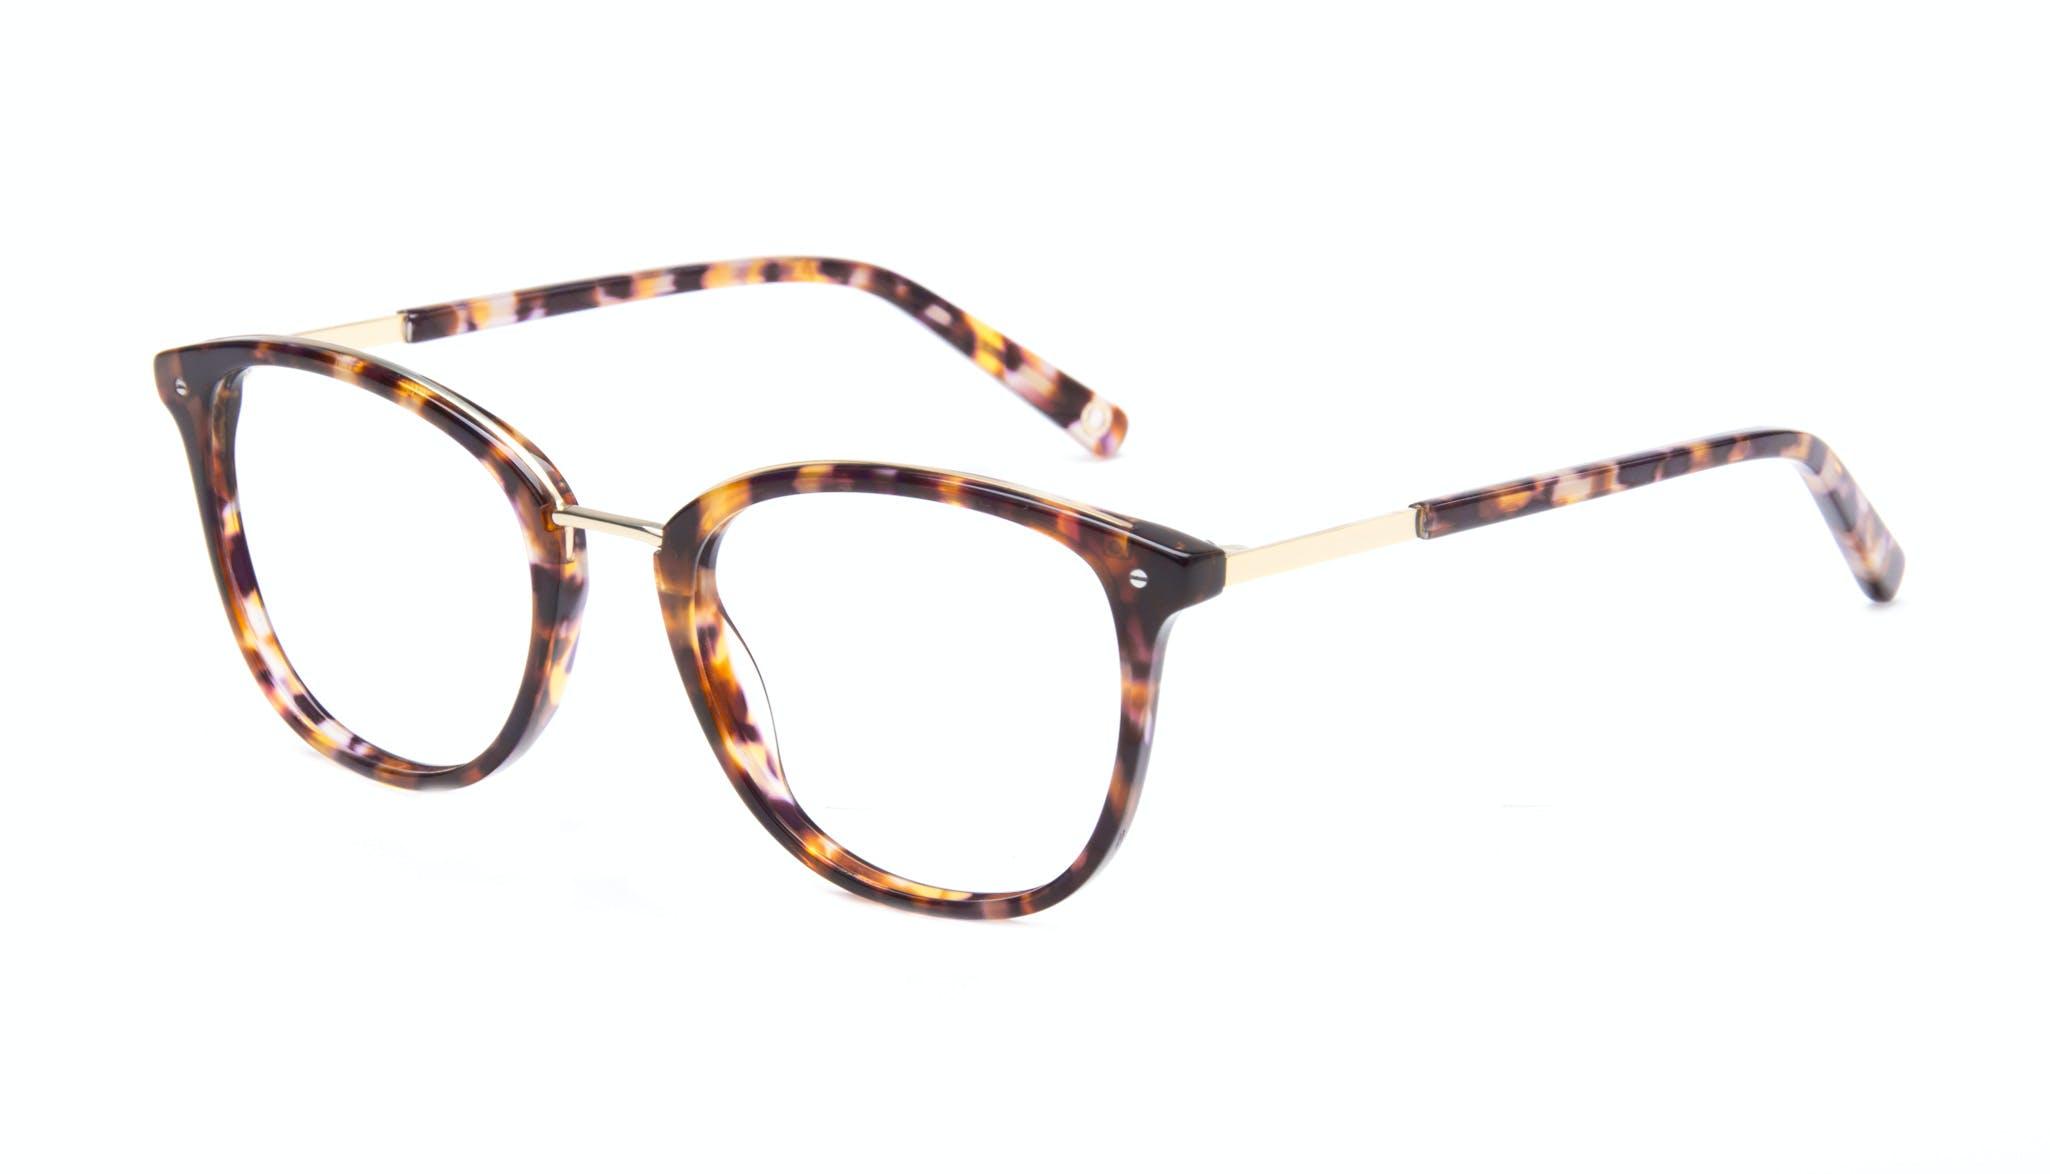 Affordable Fashion Glasses Square Round Eyeglasses Women Bella Dark Tortoise Tilt